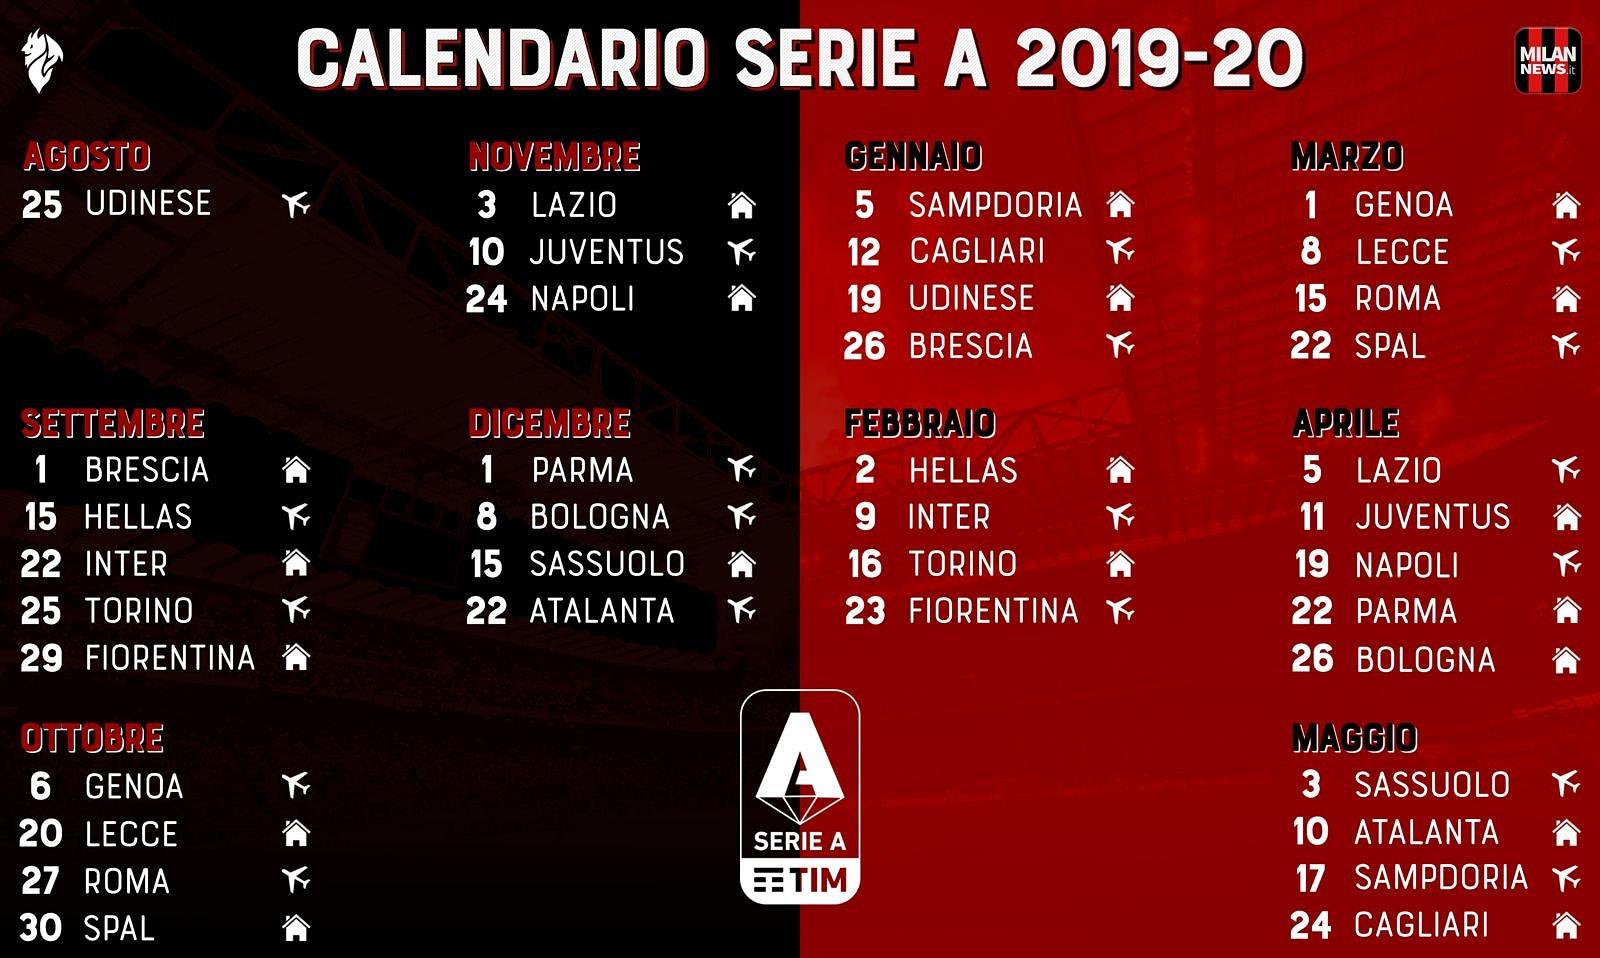 Calendario Maggio 2020.Milan Club Calendario 2019 2020 Palmi Mimmo Albergati